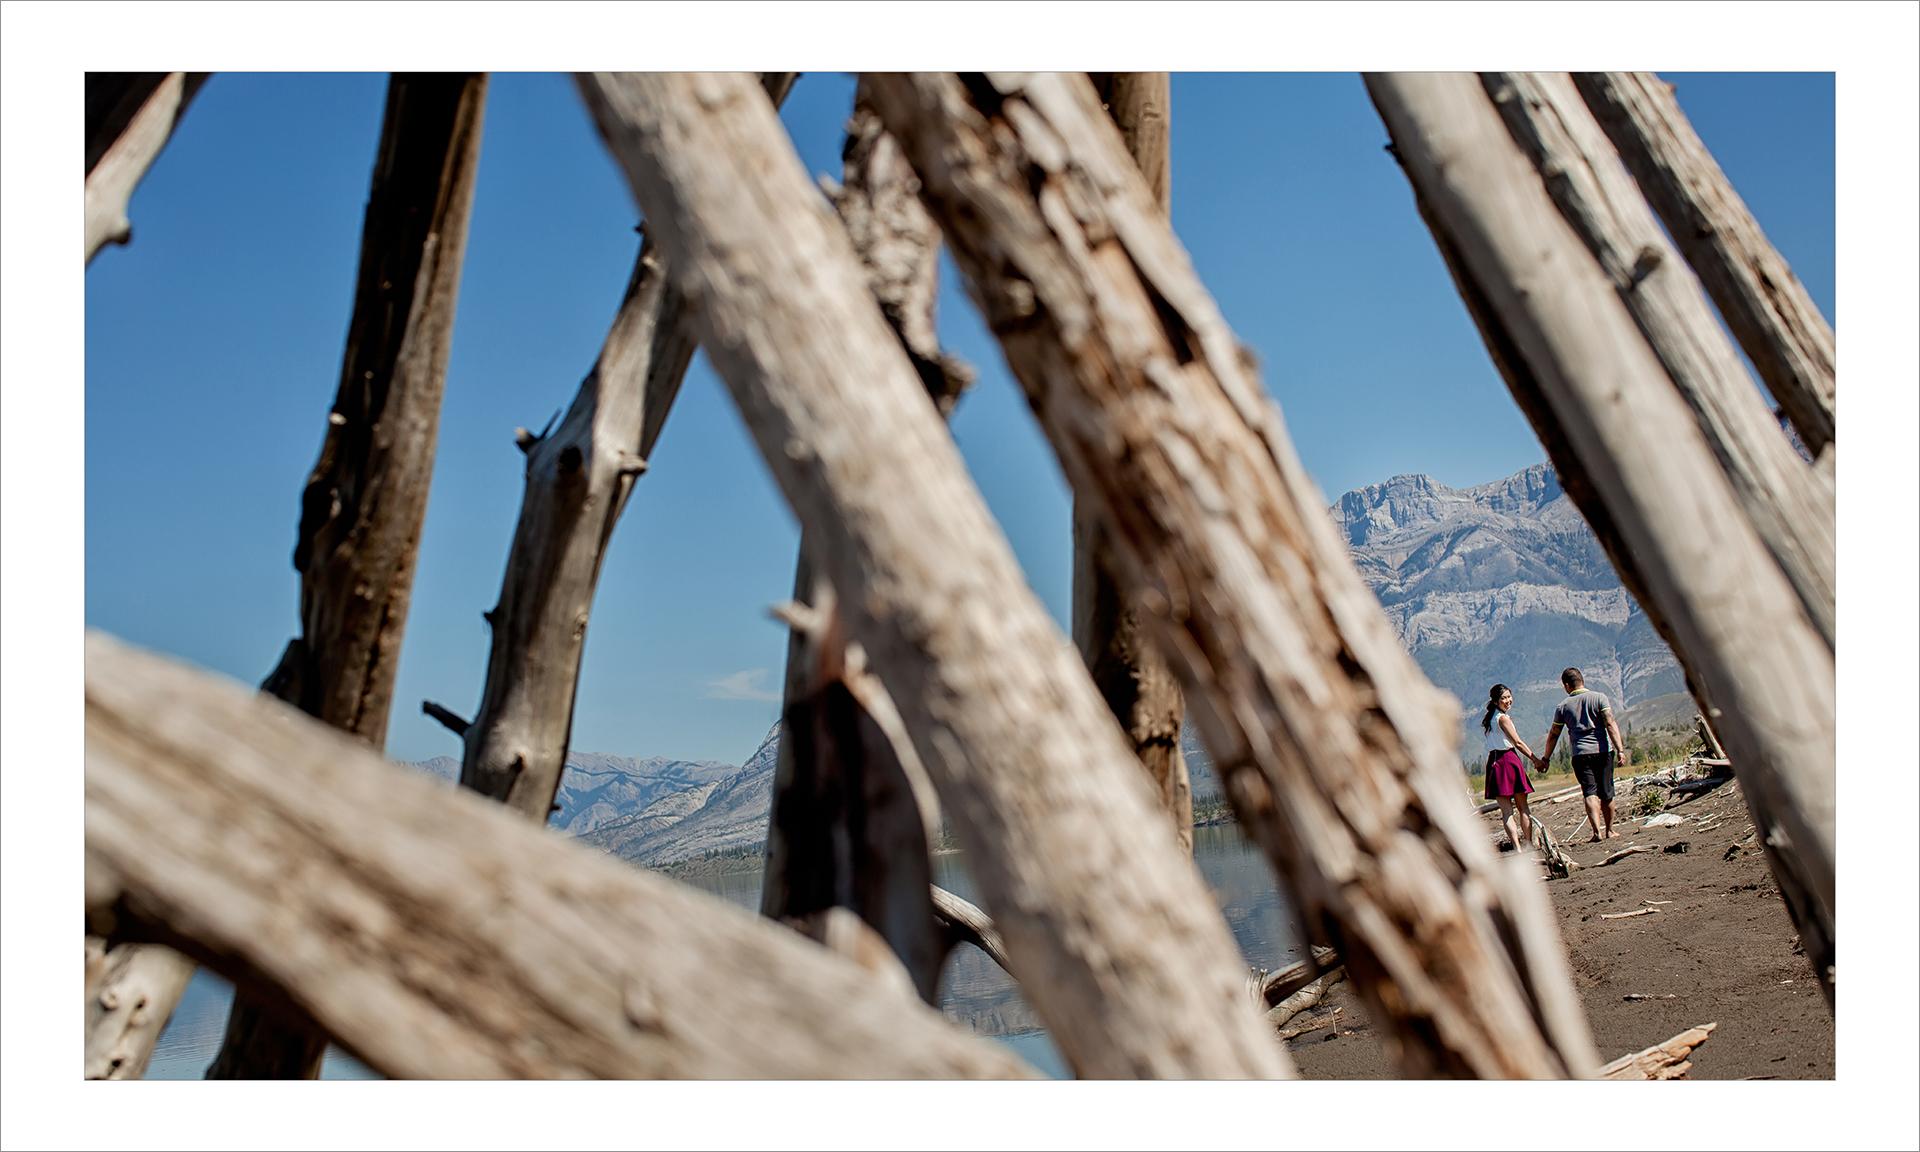 Award winning engagement photography album :: pgs 3-4